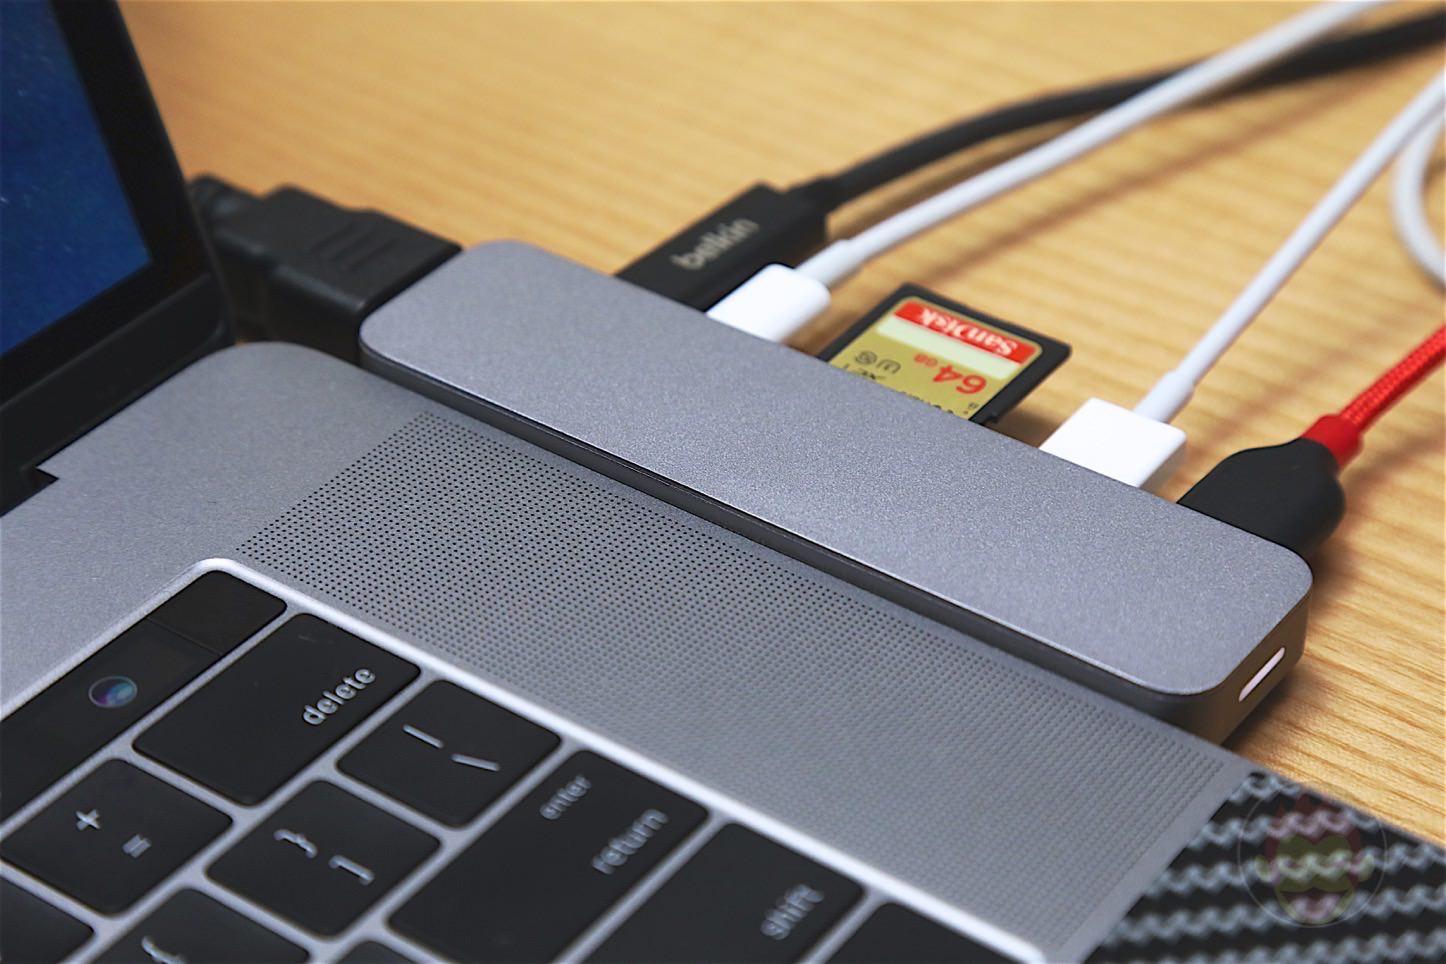 HyperDrive-Thunderbolt3-USBC-Hub-13.jpg